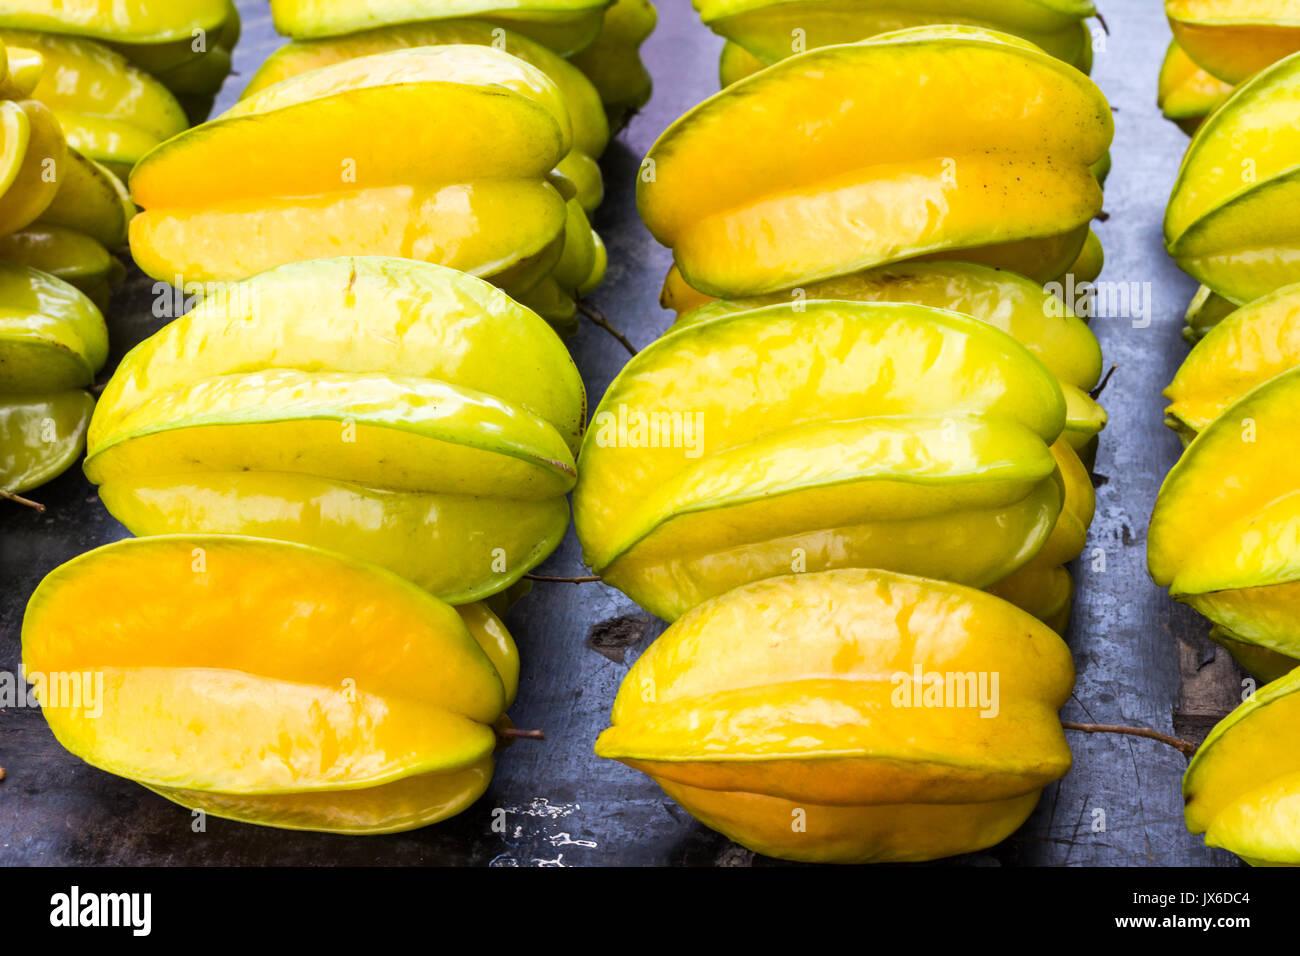 Caramboles jaune (Carambole) en vente sur un étal de marché, Bangkok, Thaïlande Photo Stock